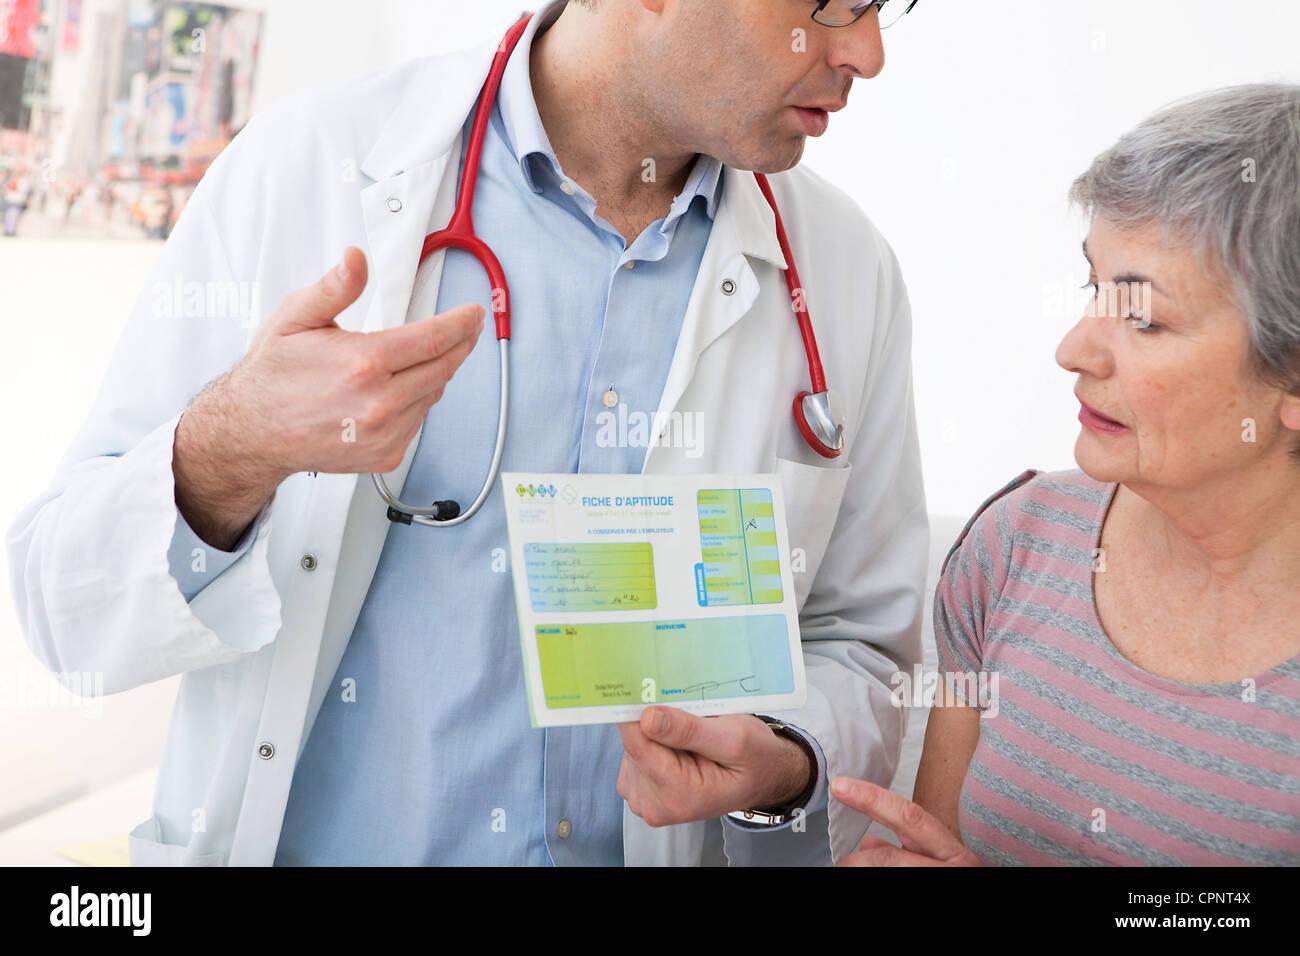 Medicina ocupacional Imagen De Stock